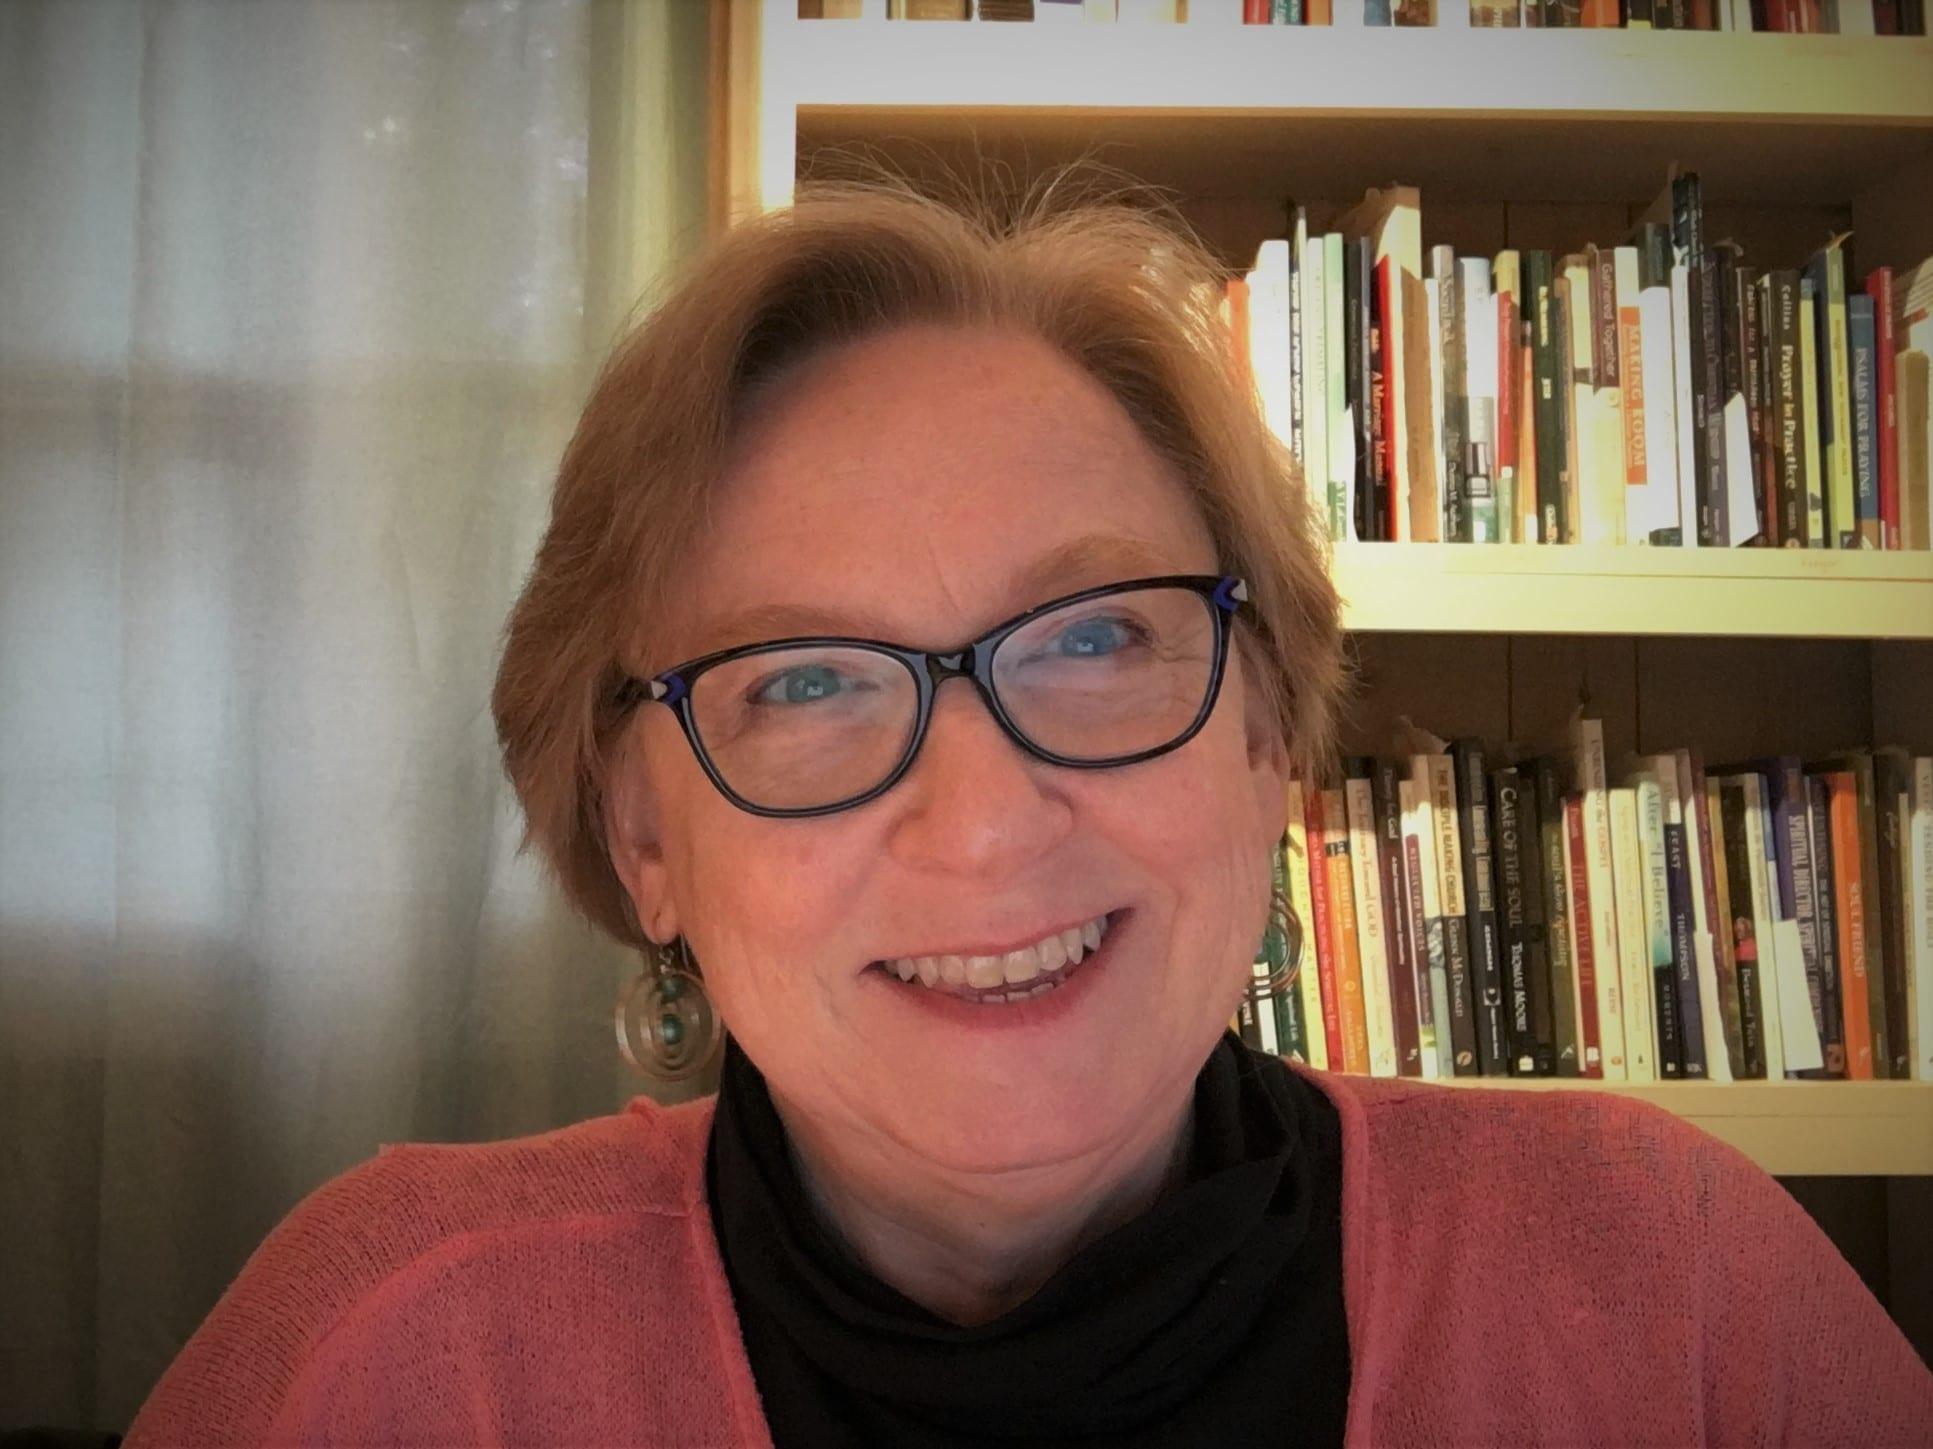 Daphne C. Reiley